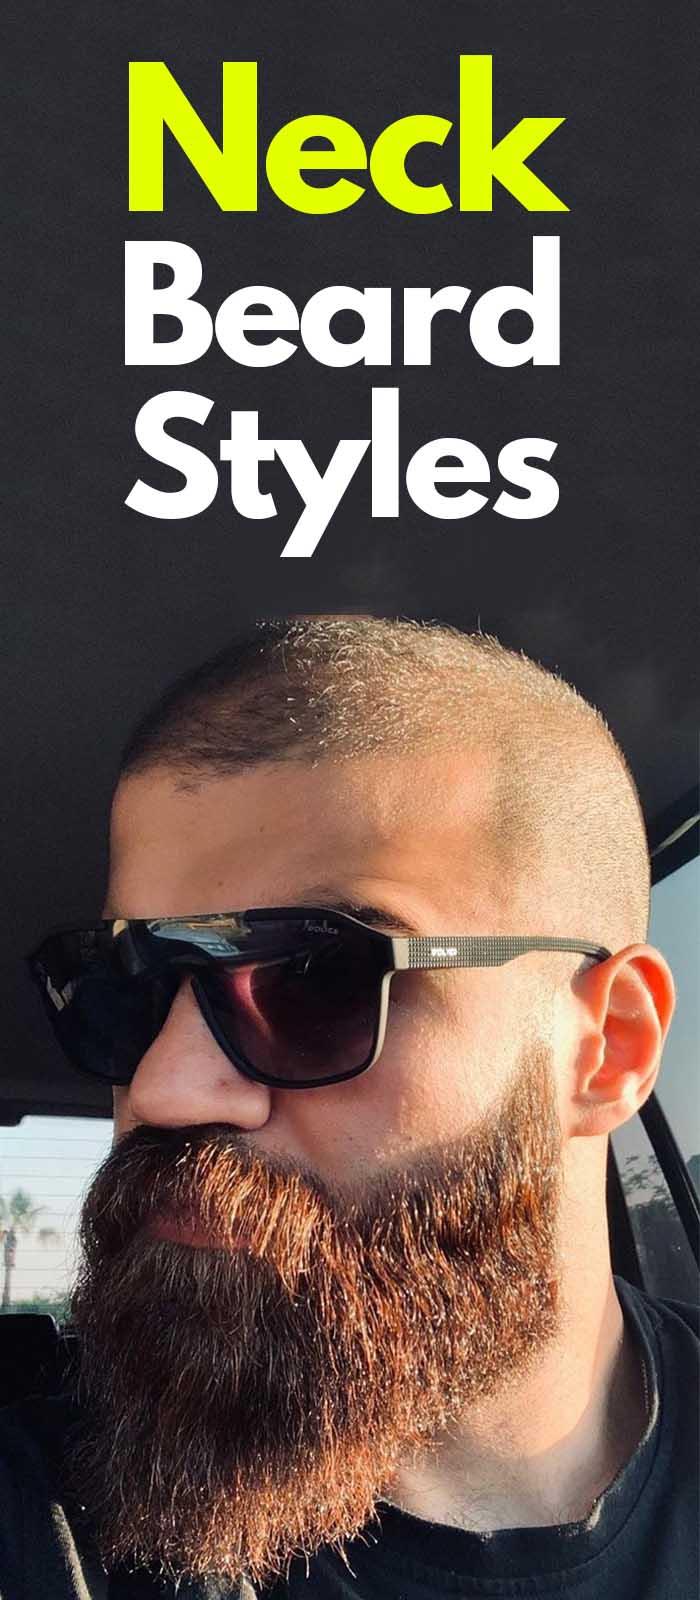 Neck Beard Styles.